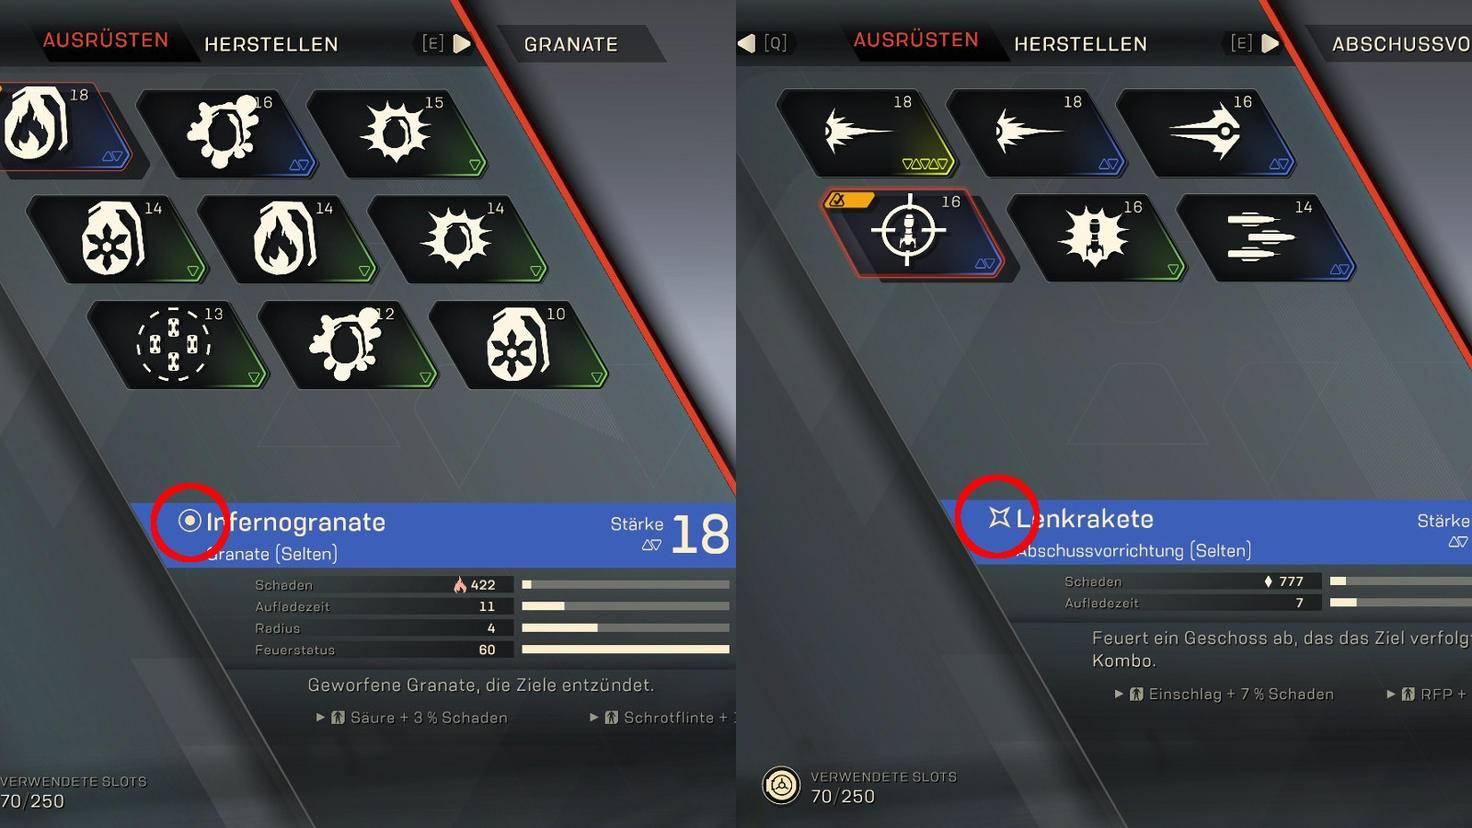 Symbolkunde: Primer (links) und Detonator (rechts).